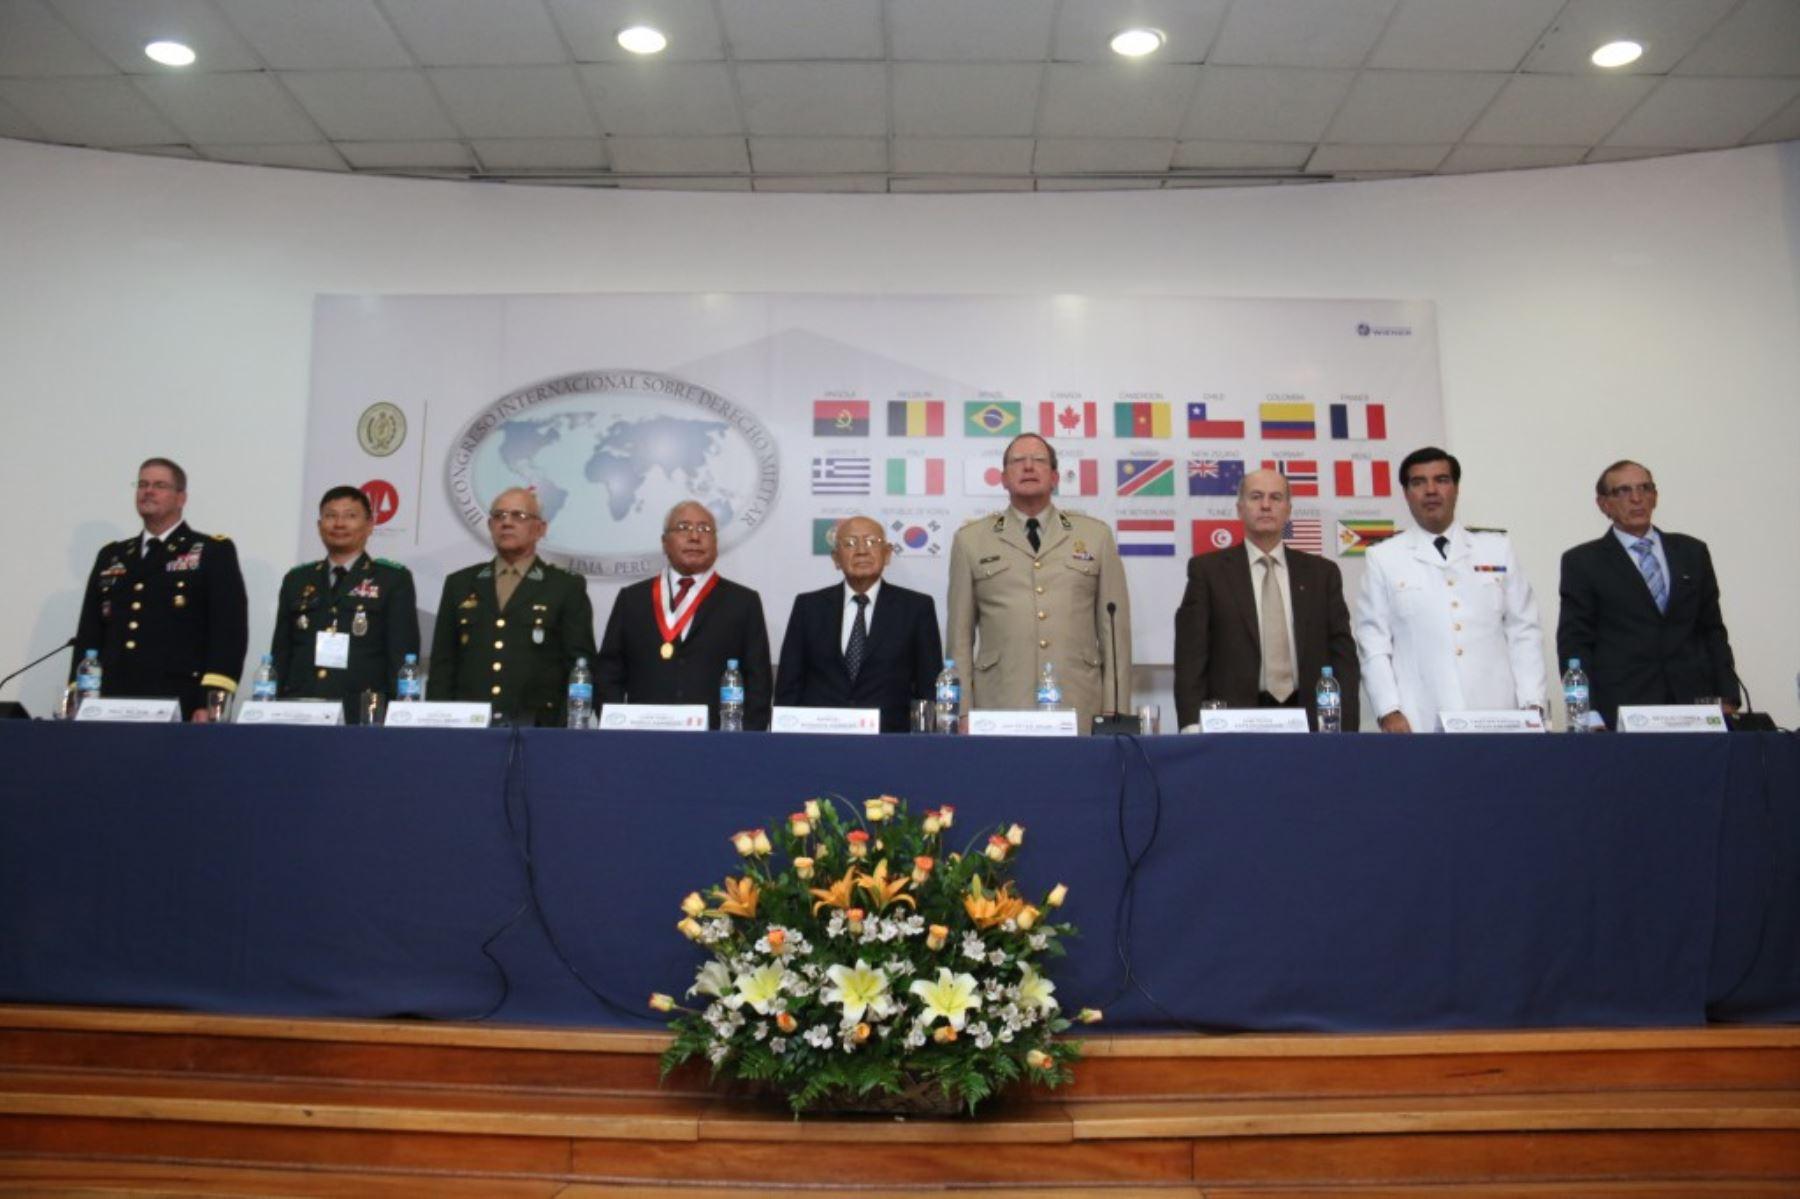 III Congreso Internacional de Derecho Militar, en Lima. Difusión